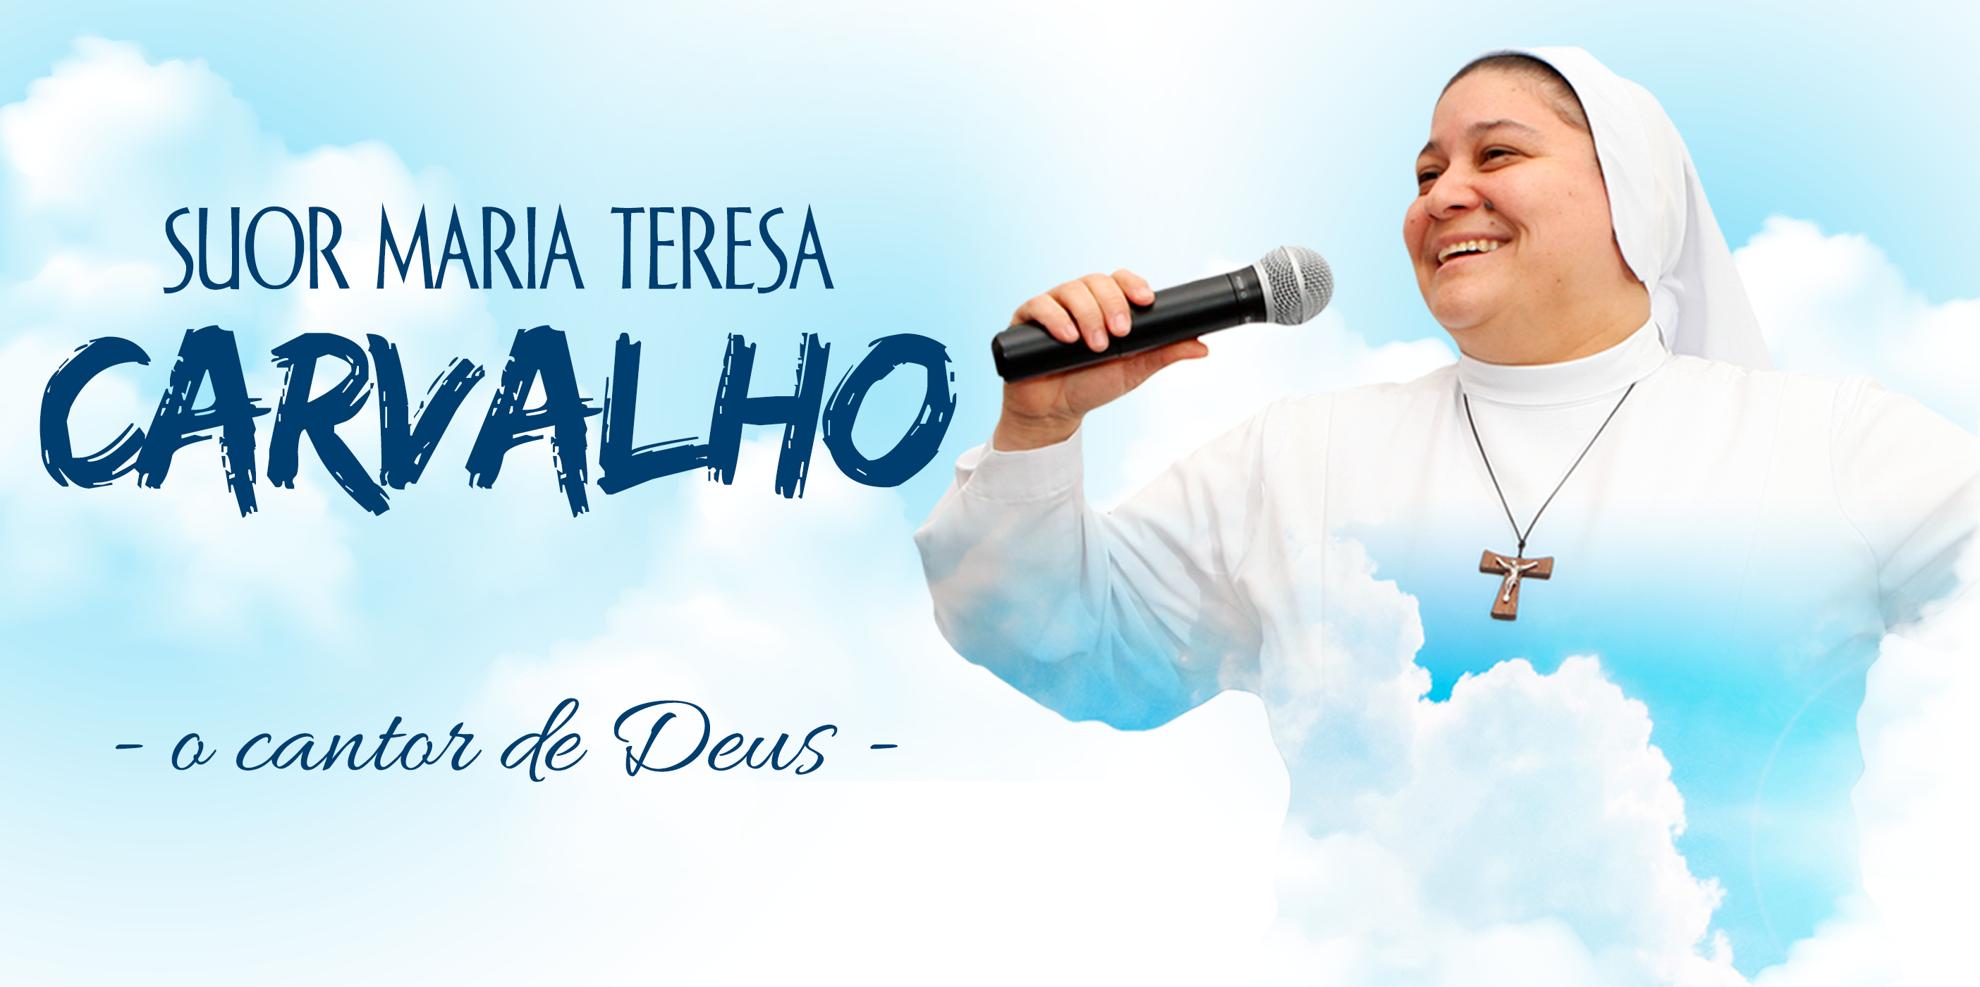 Suor Maria Teresa Carvalho